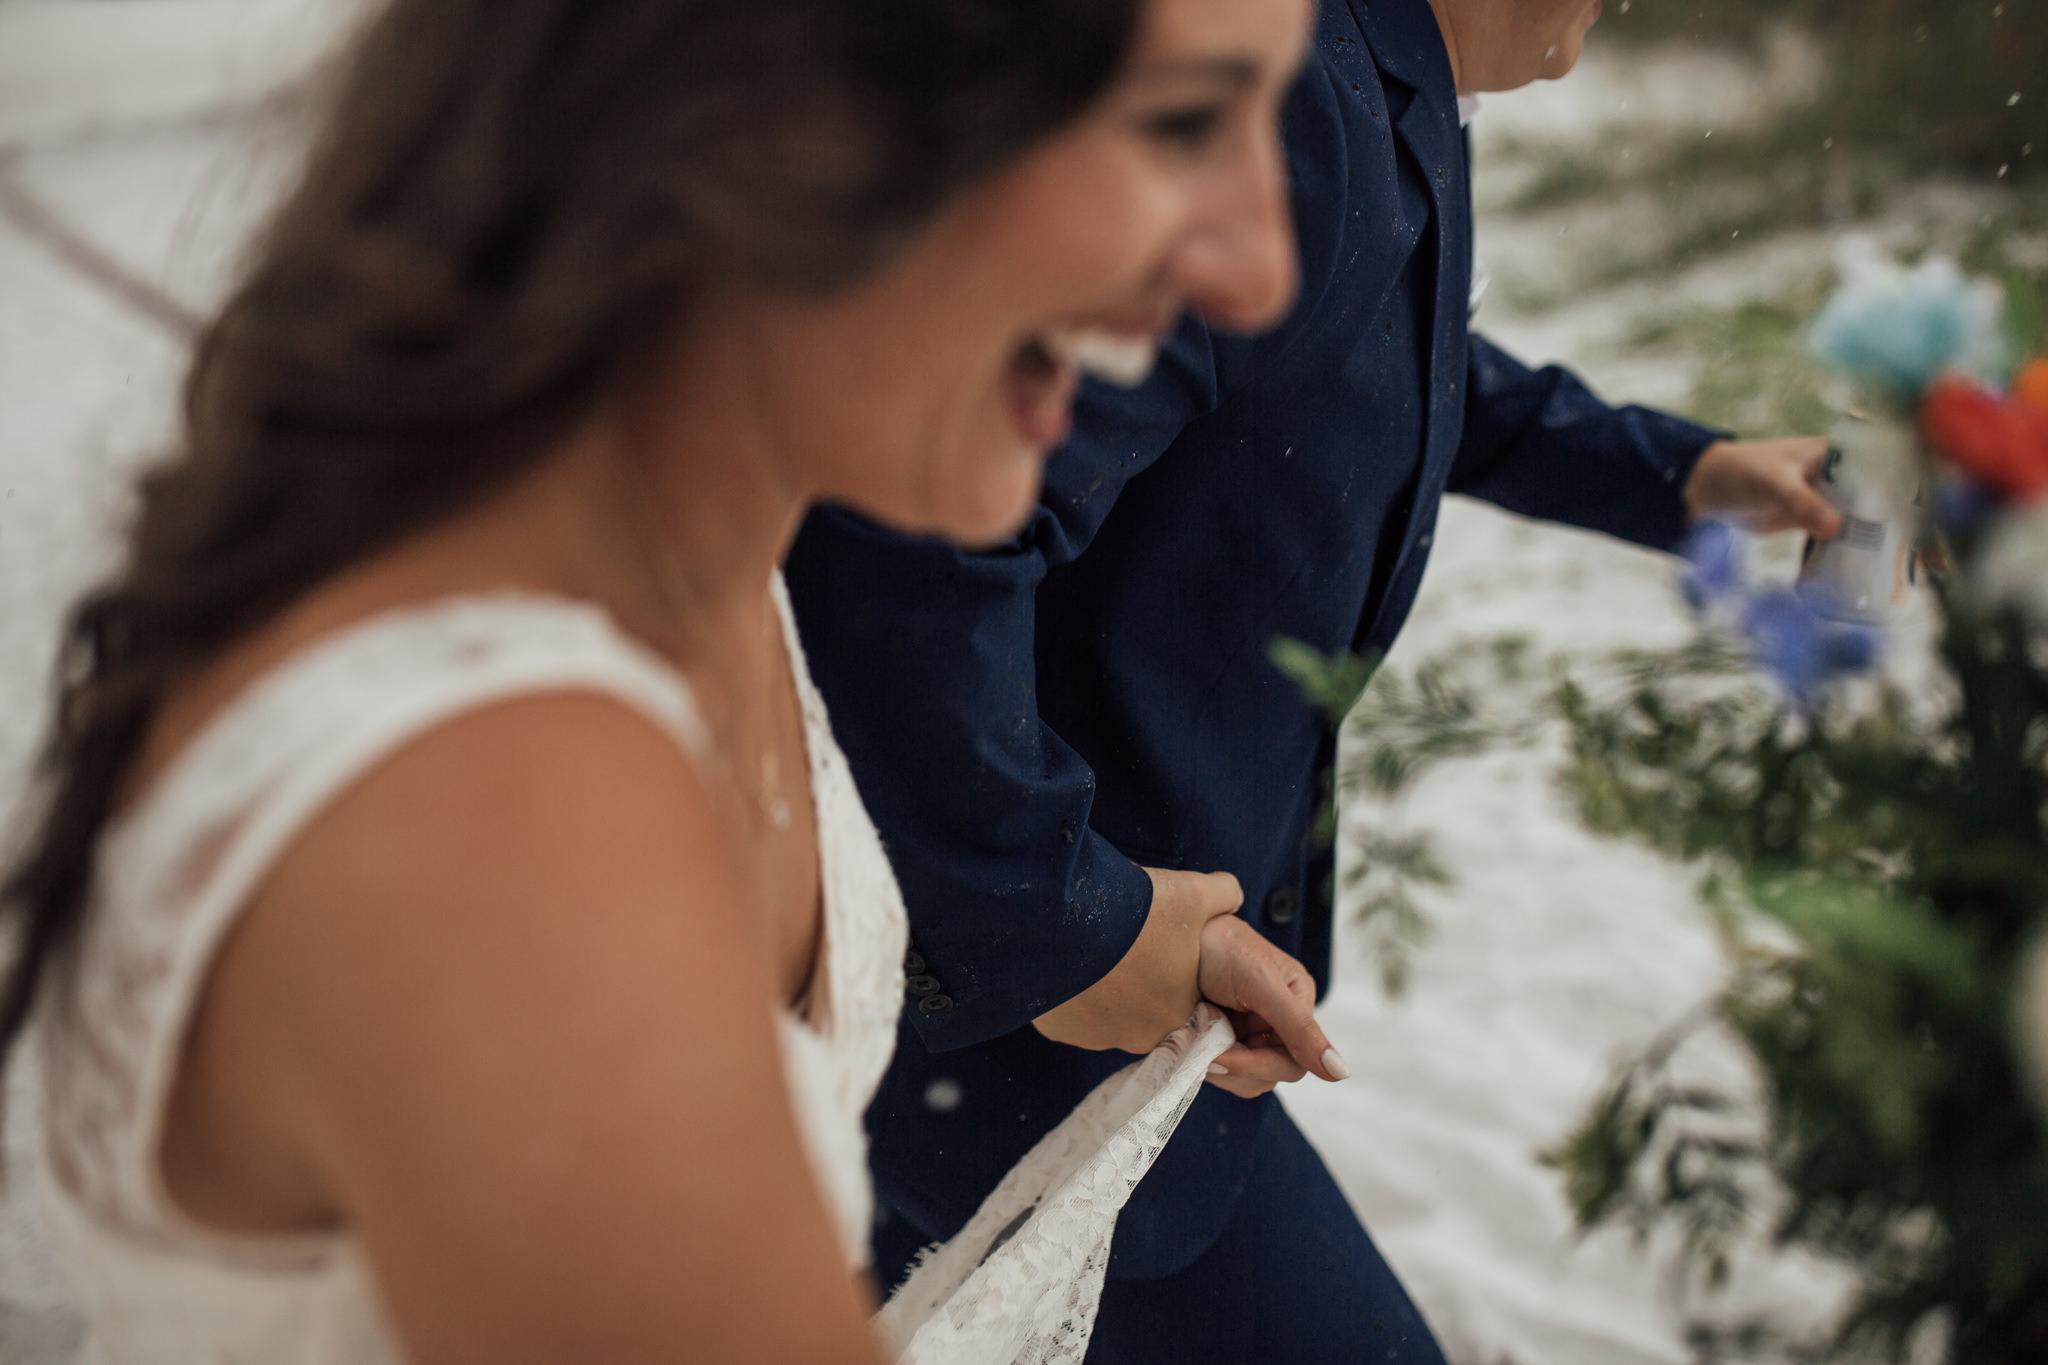 cassie-cook-photography-santa-rosa-beach-fl-wedding-farrar-wedding-beach-wedding-destination-wedding-9-2.jpg